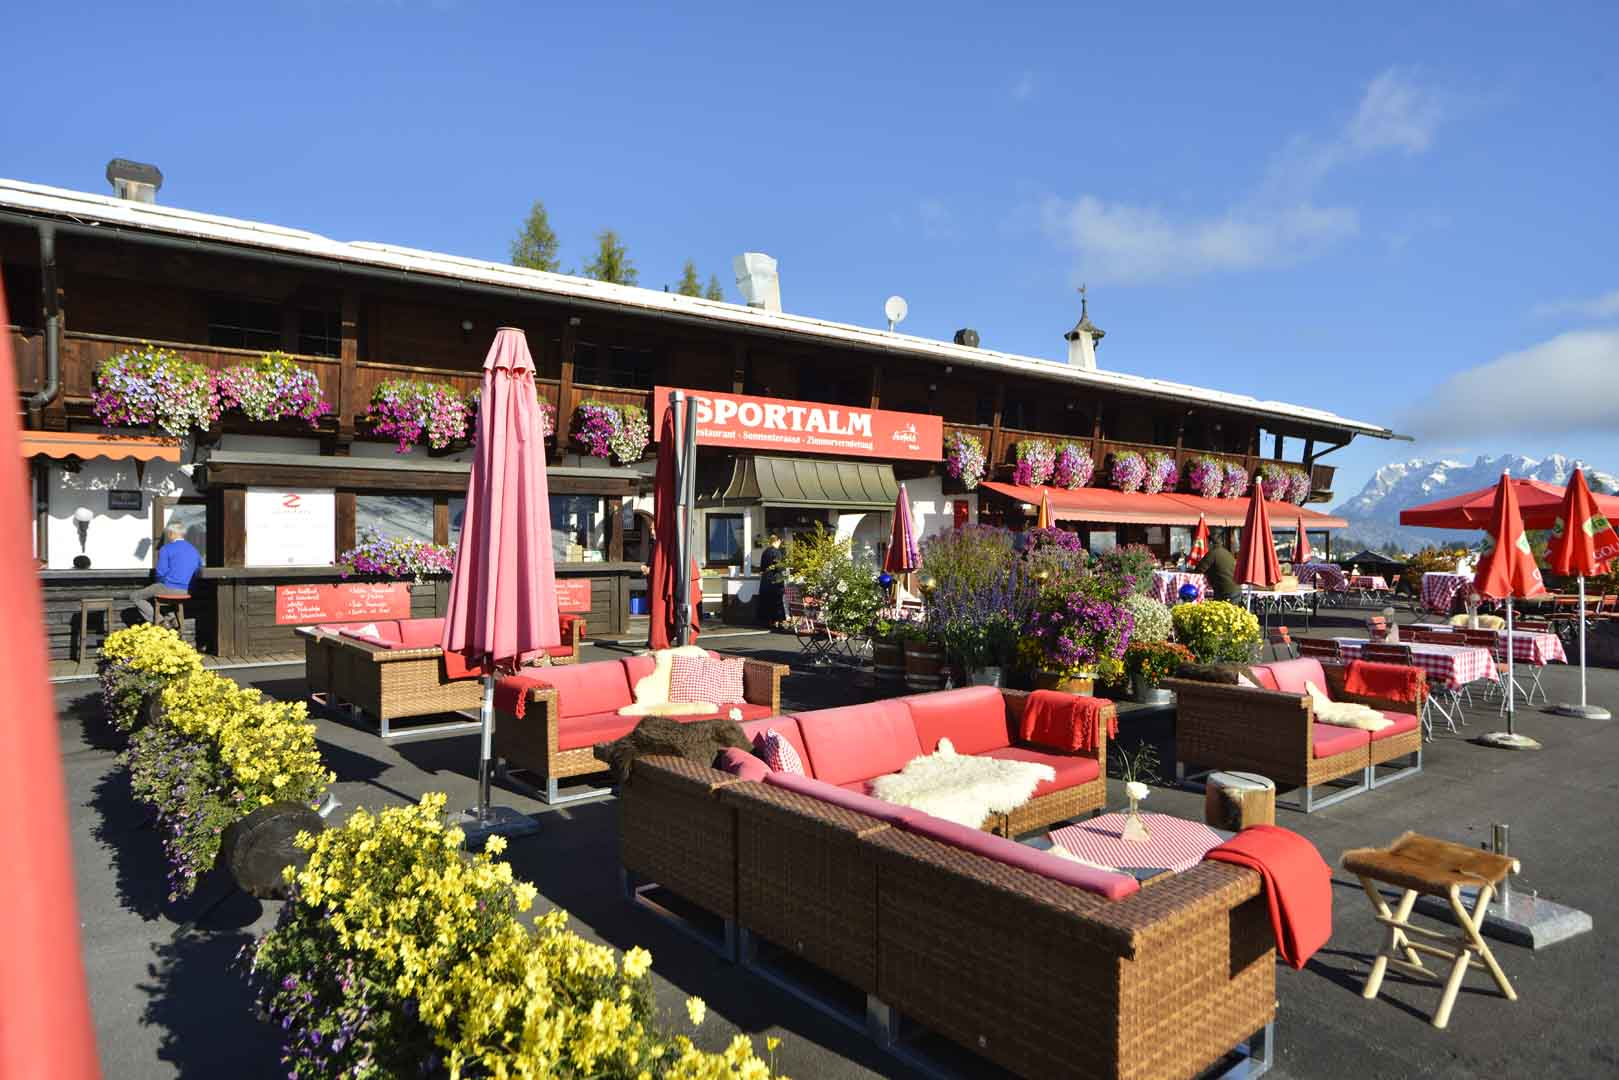 sportalm-seefeld-tirol-bar-restaurant-schneebar-lounge-08